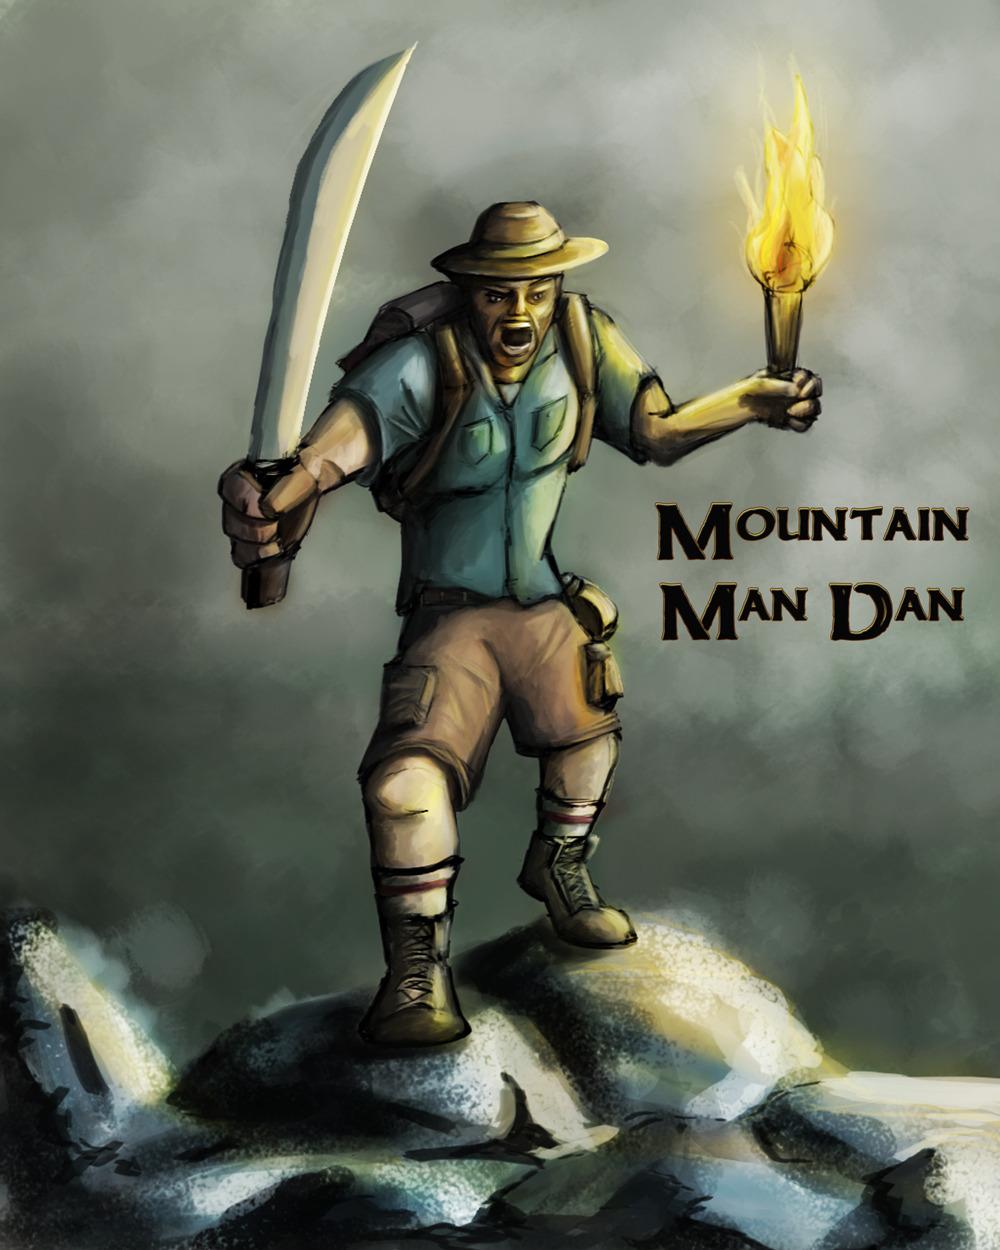 Mountain Man Dan